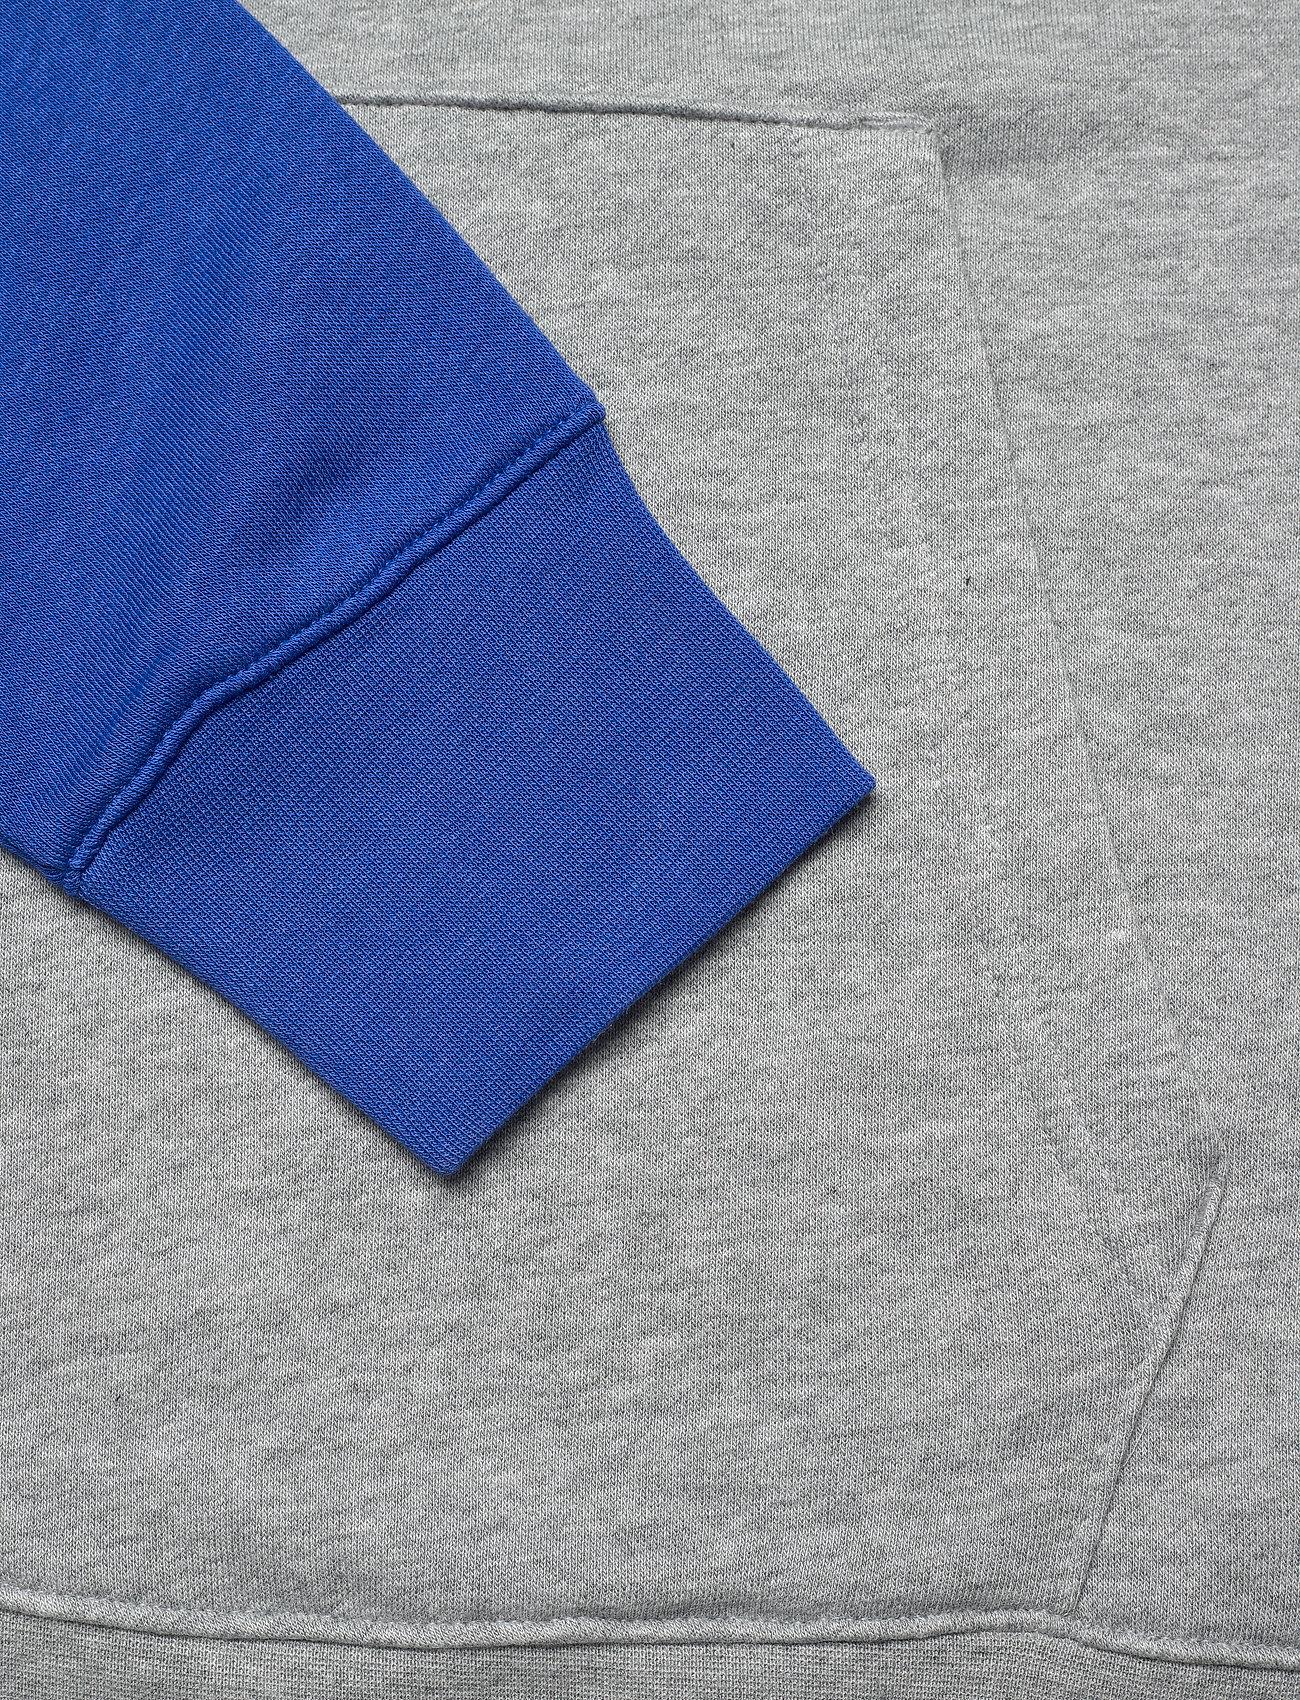 NIKE Fan Gear Los Angeles Rams Nike Wordmark Long Sleeve Heritage Hoodie - Sweatshirts DARK GREY HEATHER / LIGHT BONE / HYPER ROYAL - Menn Klær